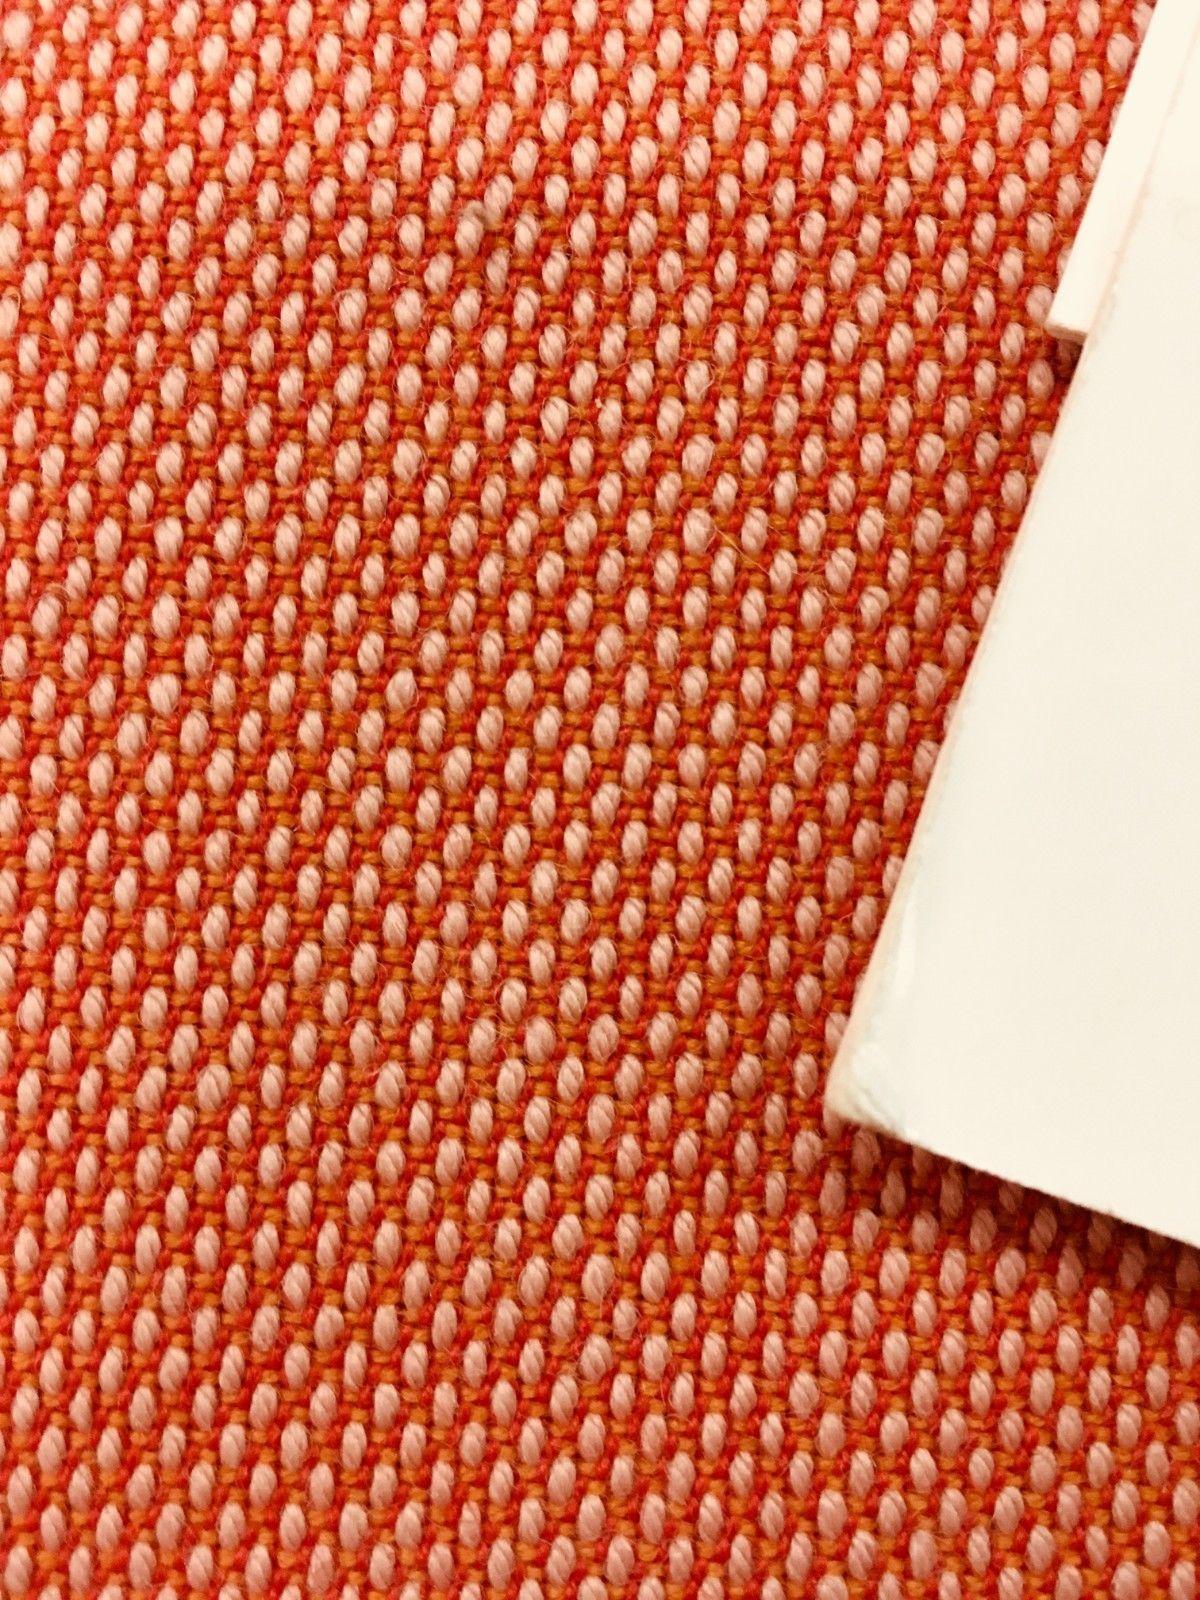 Maharam Upholstery Fabric Steelcut Trio Peach Wool 1.375 yds 465906 PI